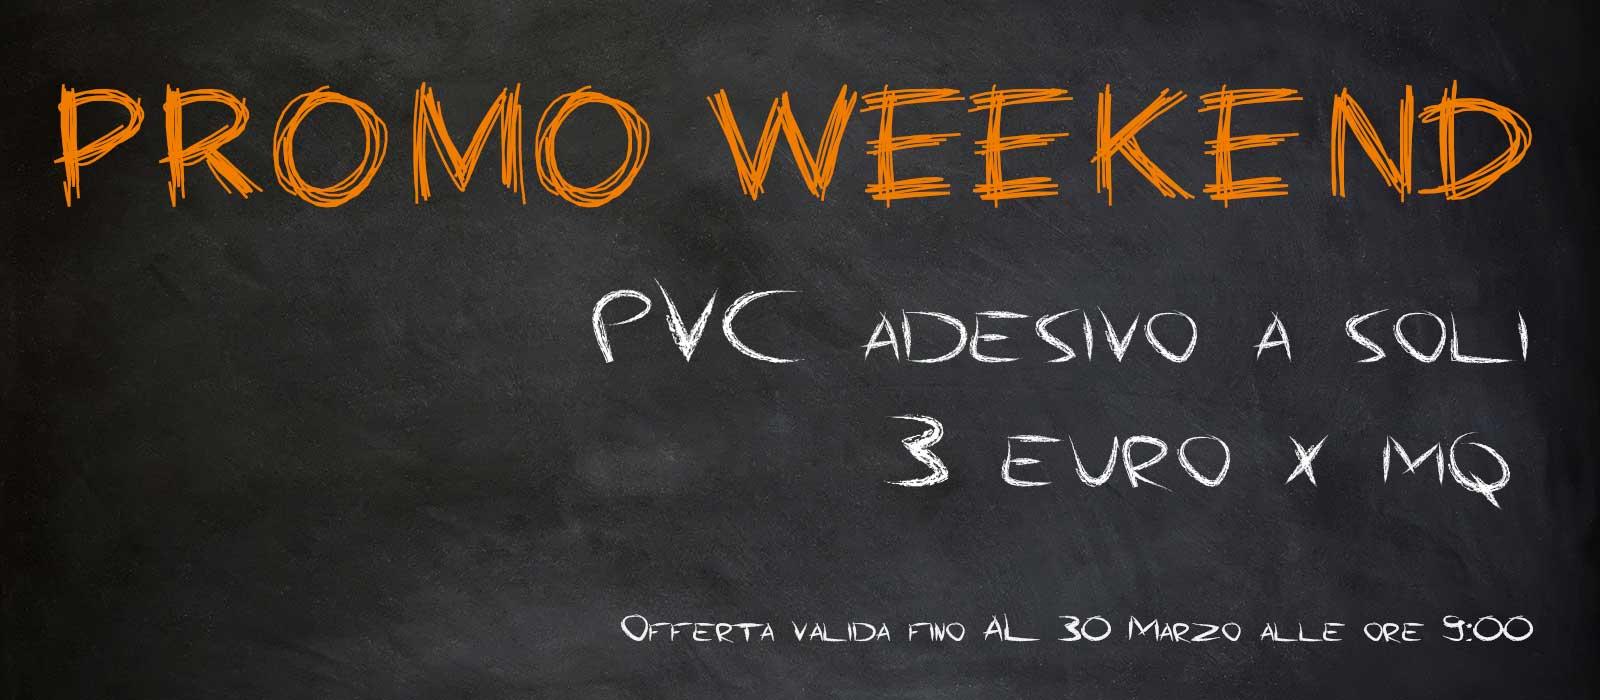 Promo Weekend – PVC Adesivo!